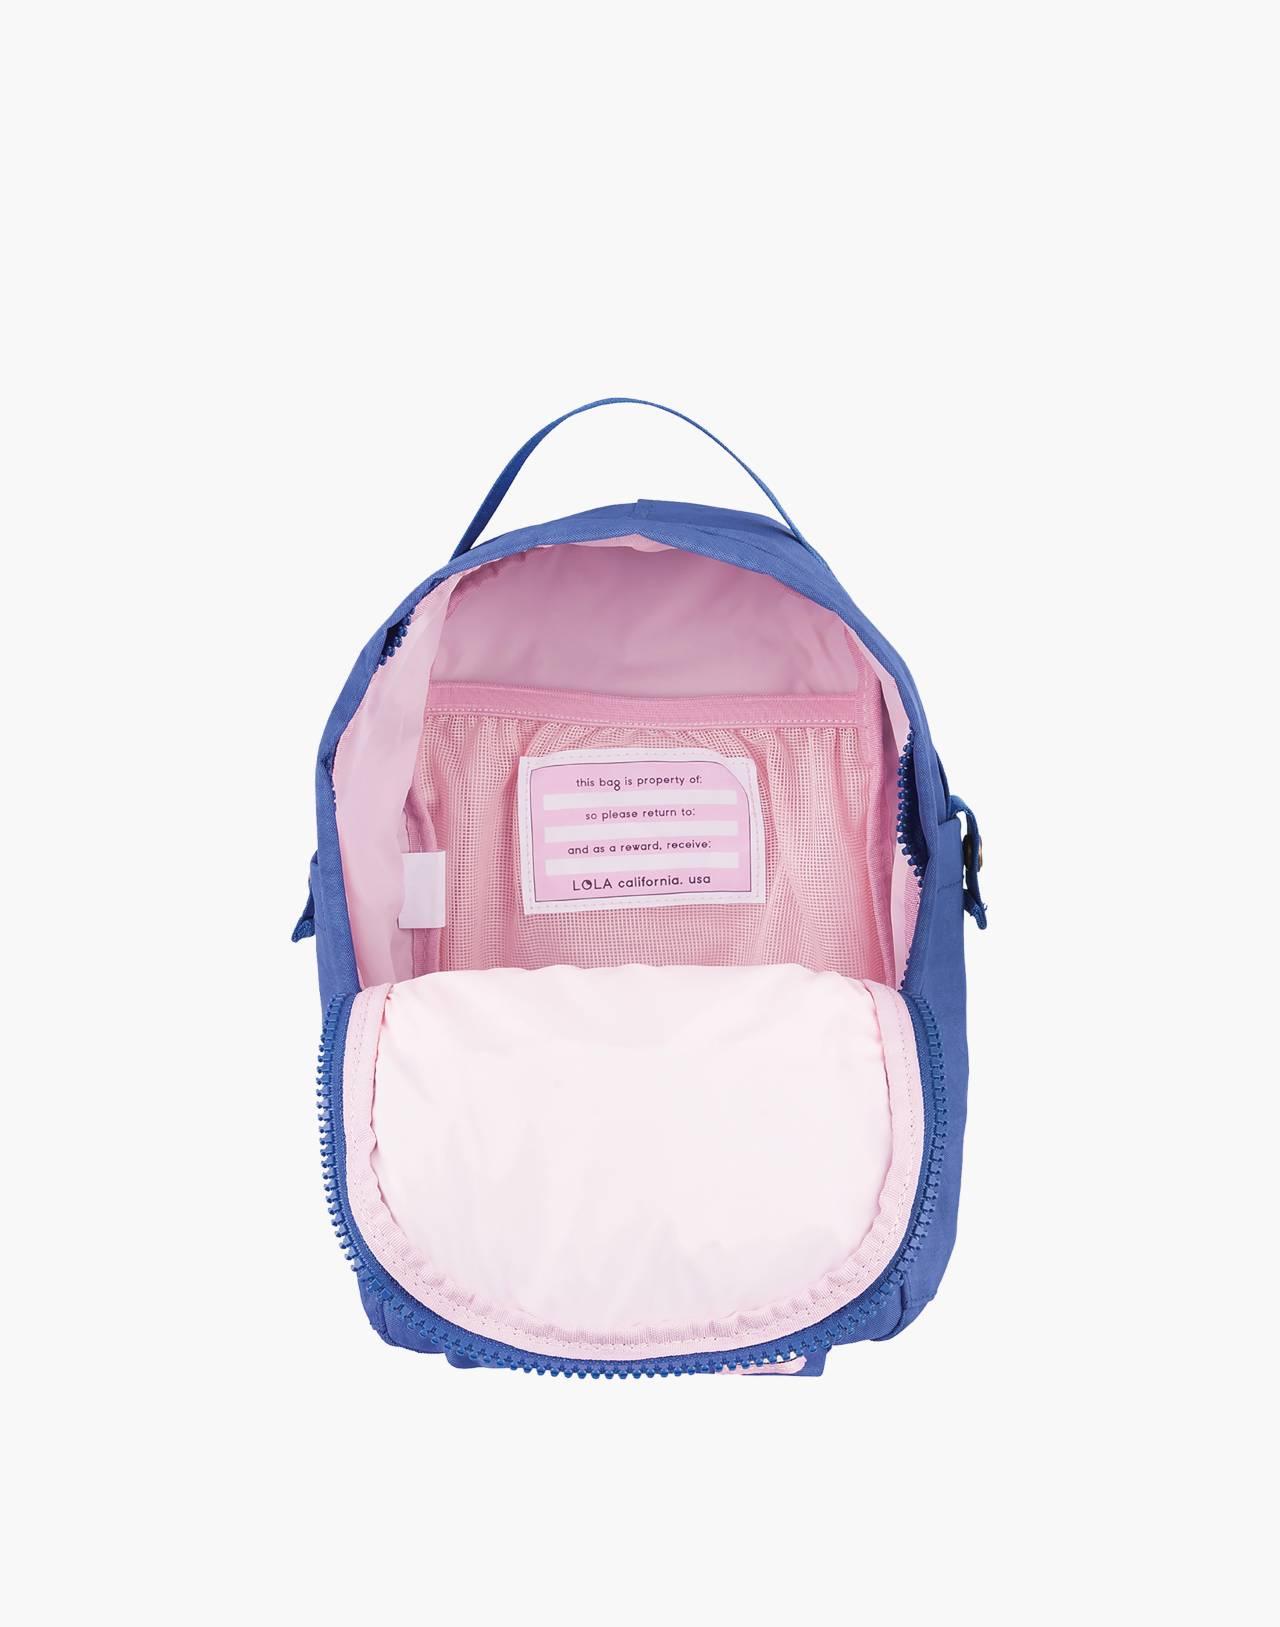 LOLA™ Mondo Utopian Small Backpack in blue image 2